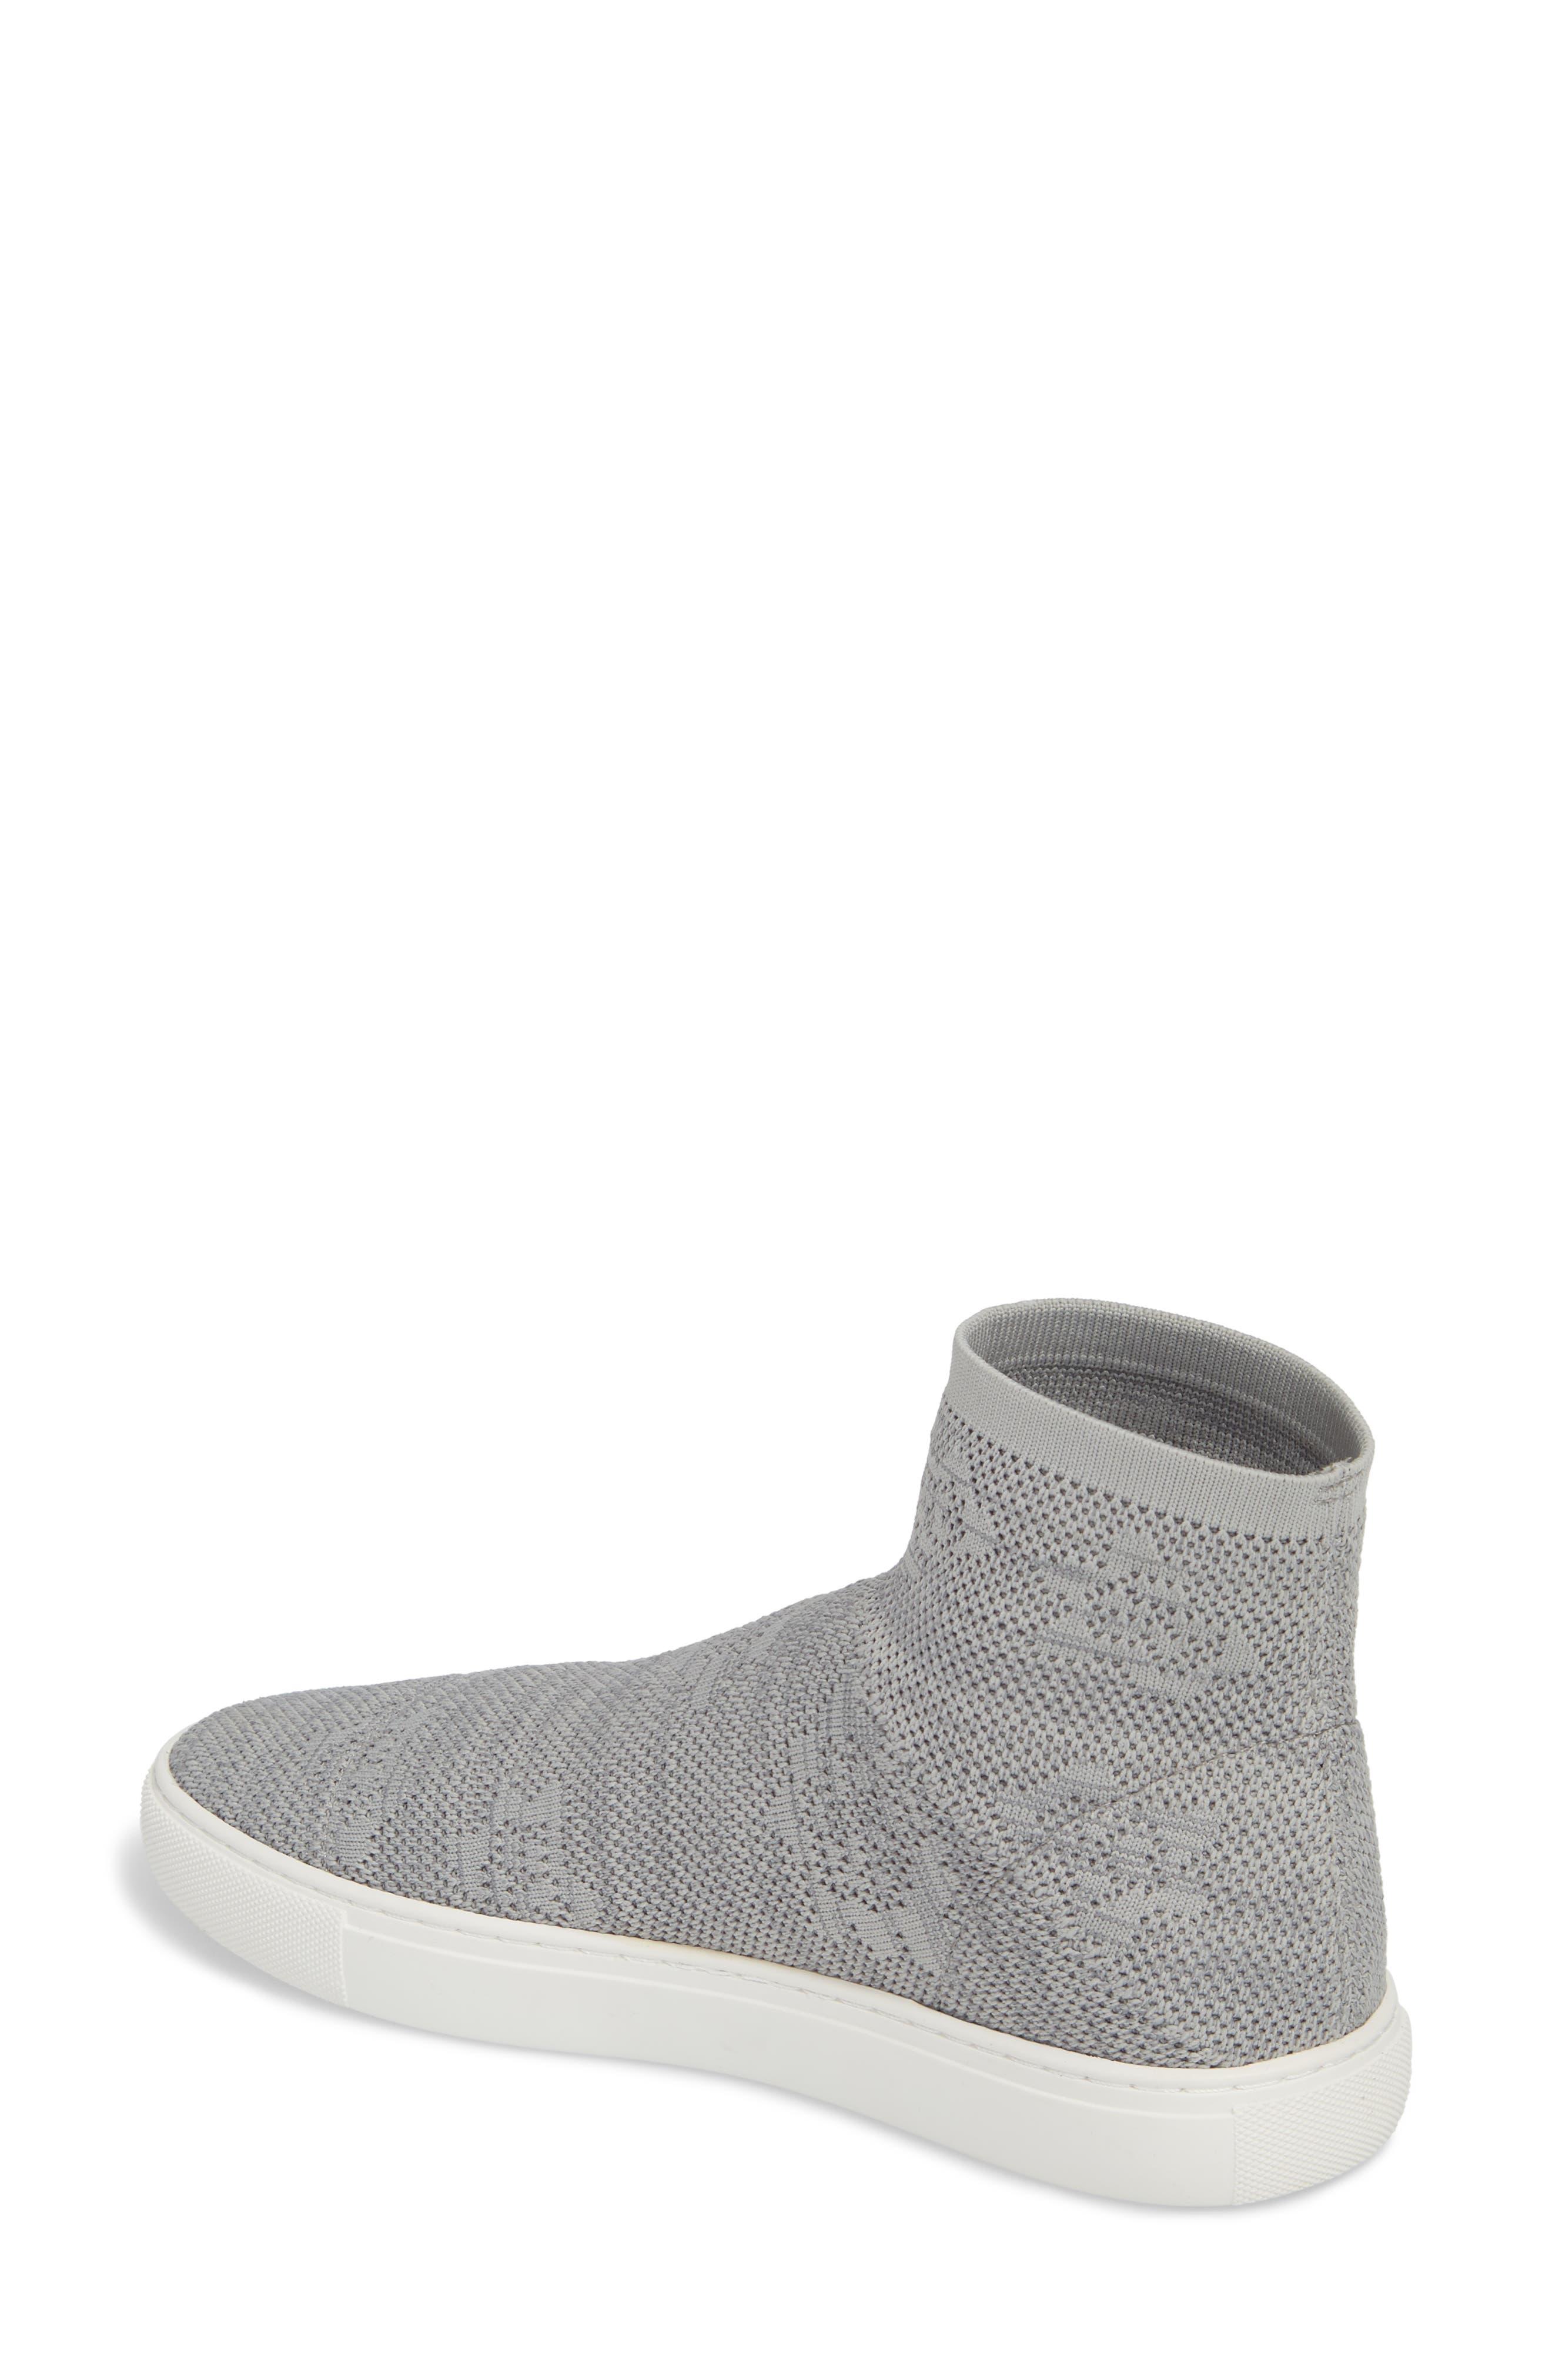 Keating Sneaker,                             Alternate thumbnail 2, color,                             Dust Grey Fabric